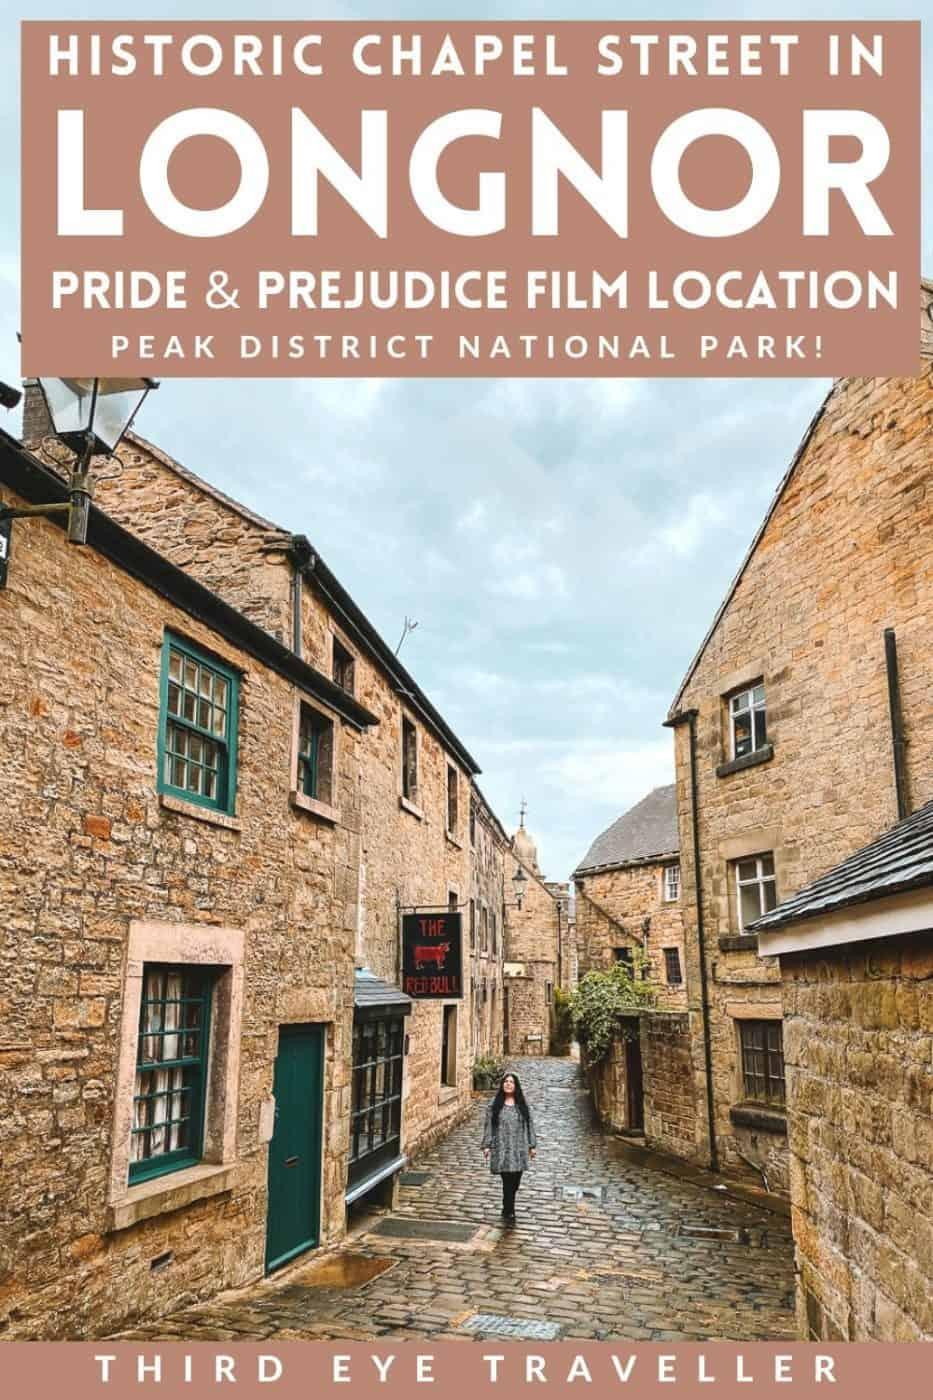 Chapel Street Longnor Pride and Prejudice Filming Location